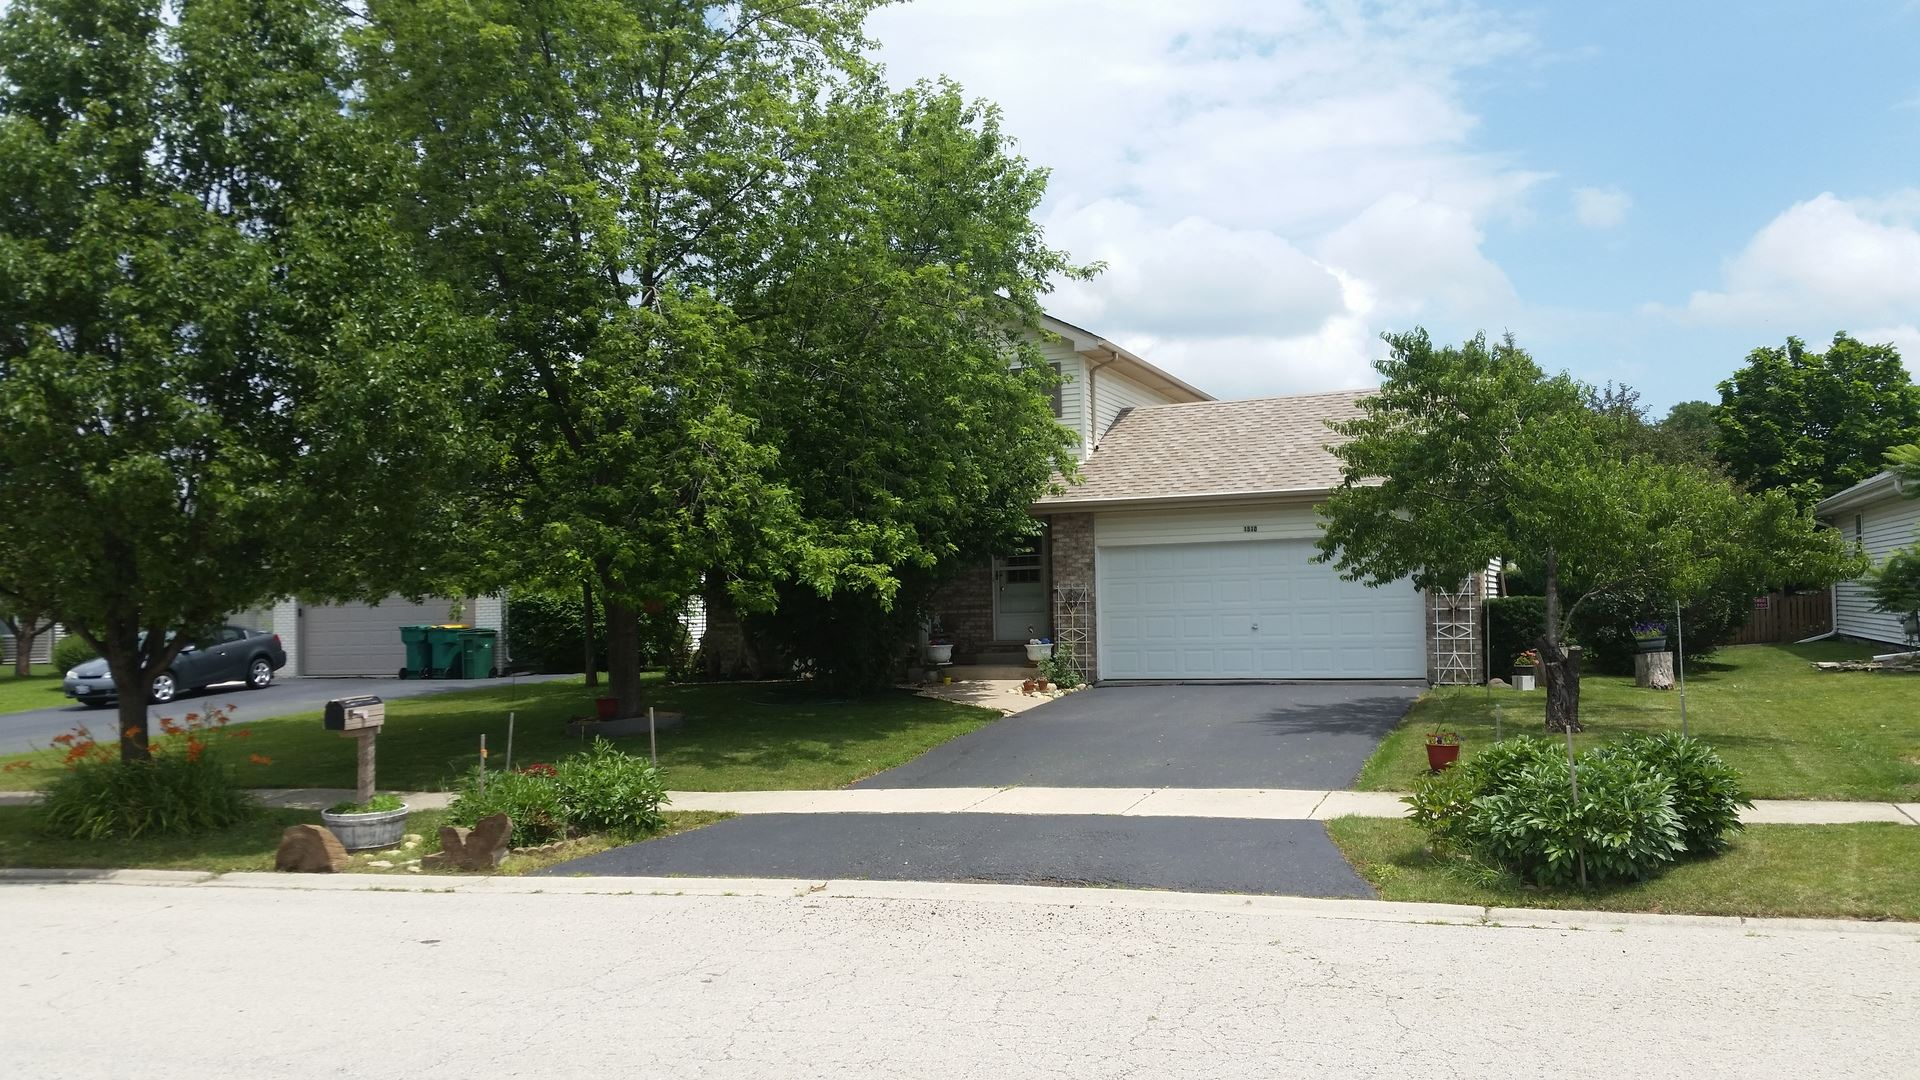 Photo of 1510 Finch Drive, Plainfield, IL 60586 (MLS # 11157825)